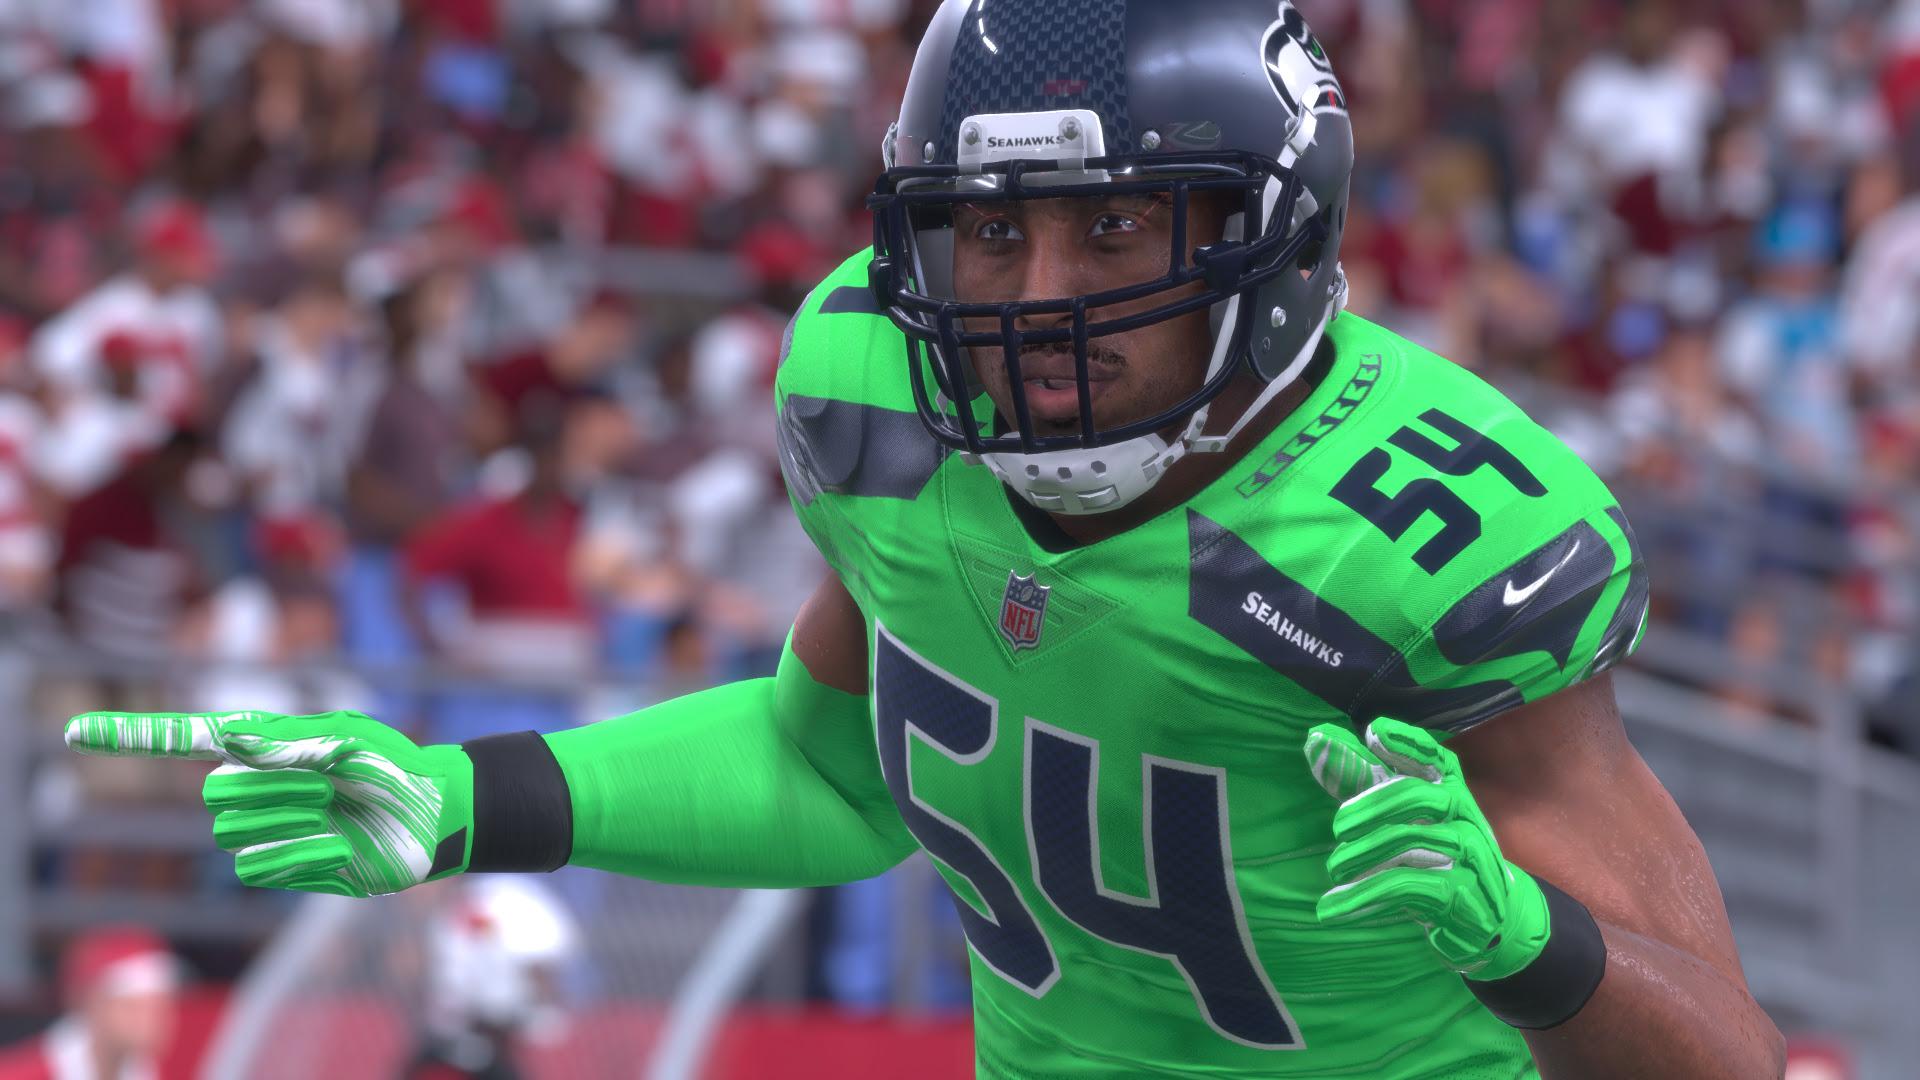 Madden NFL 18 roster update details following week nine of the season  pastapadre.com